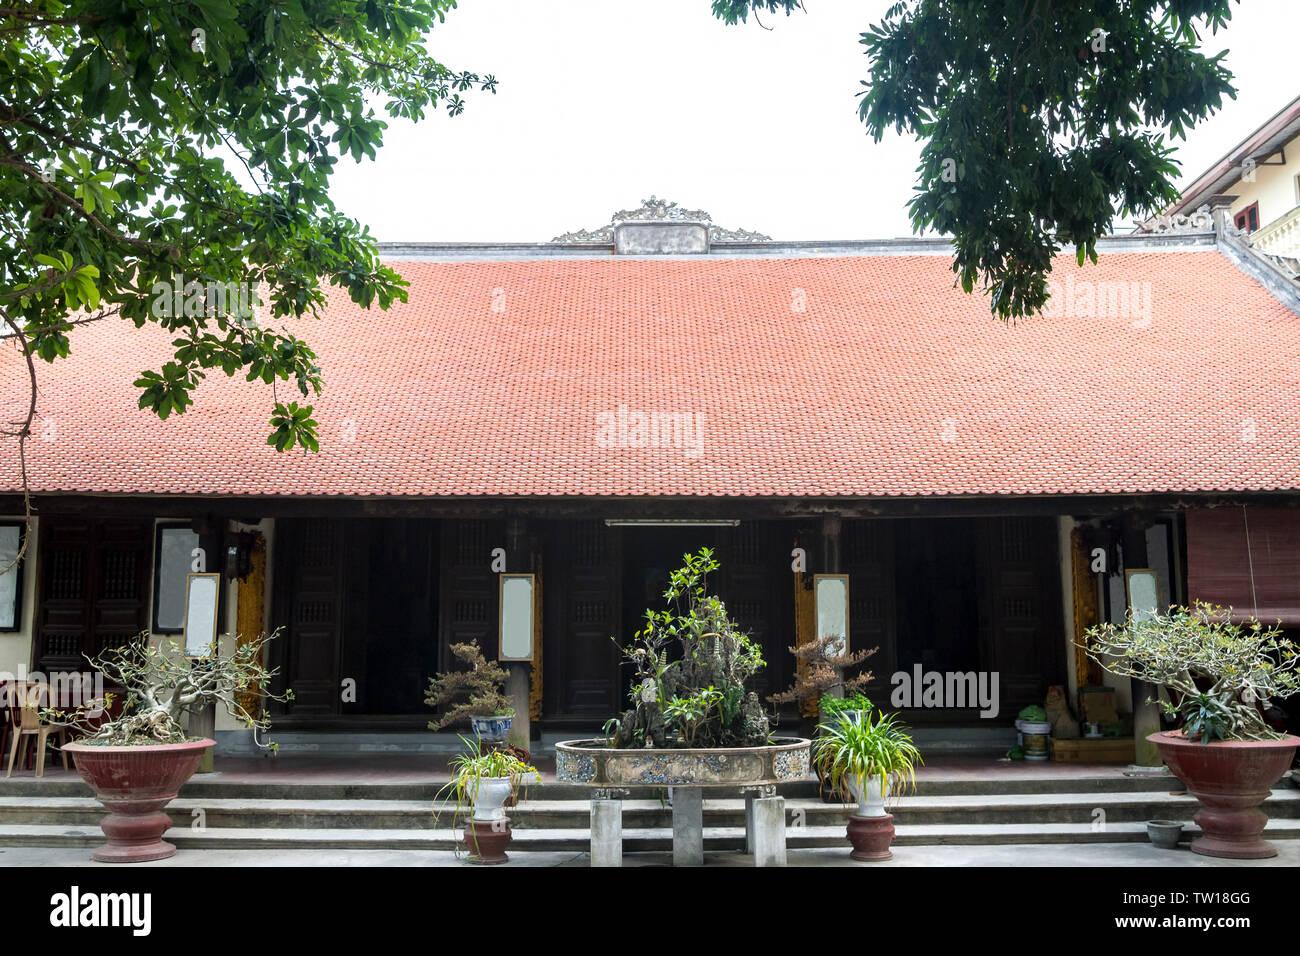 Pagoda of Pho Chieu Temple in Hai Phong, Vietnam Stock Photo